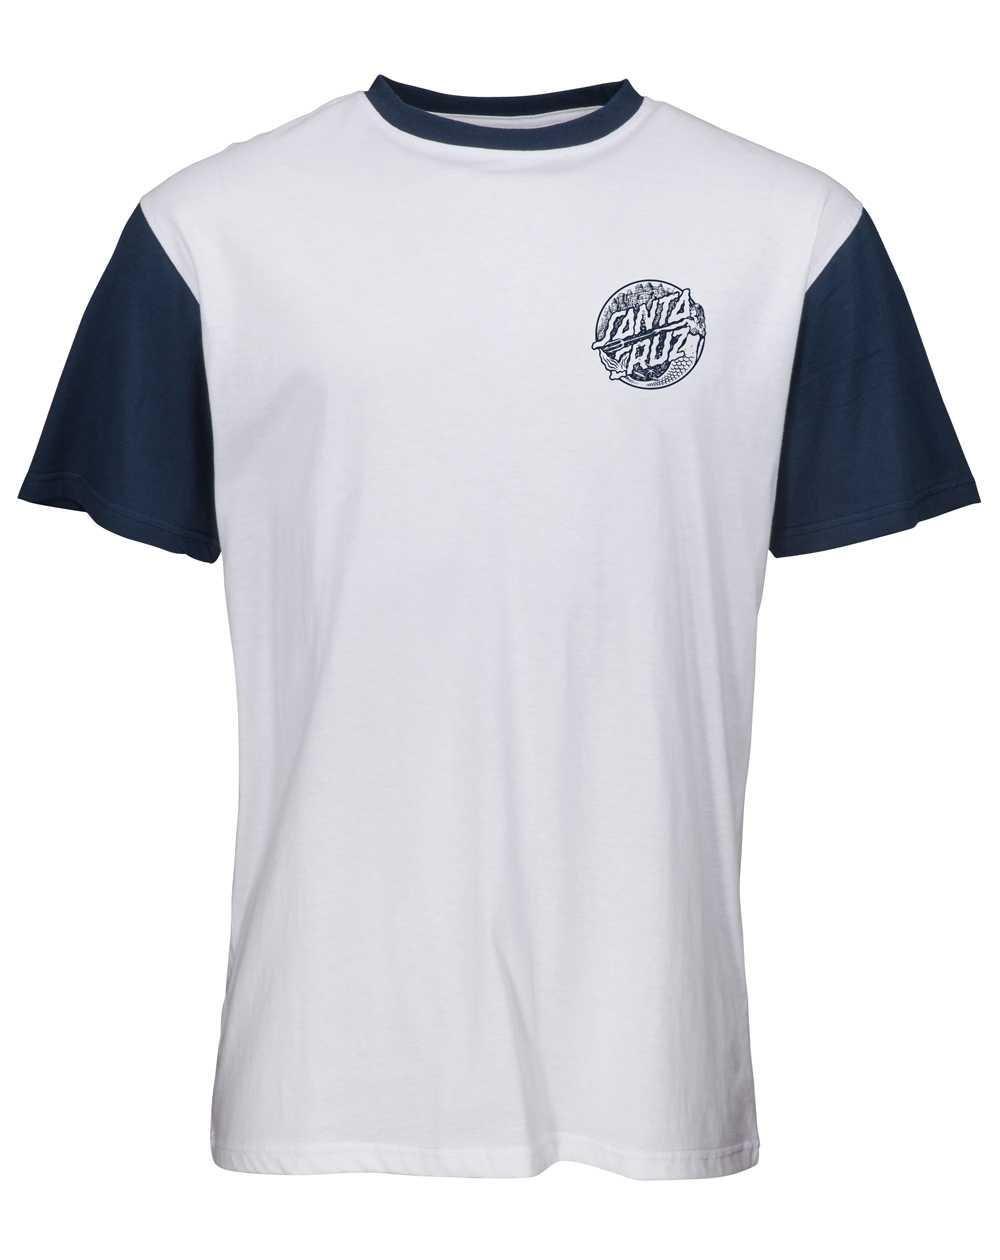 Santa Cruz Herren T-Shirt Mermaid Dot White